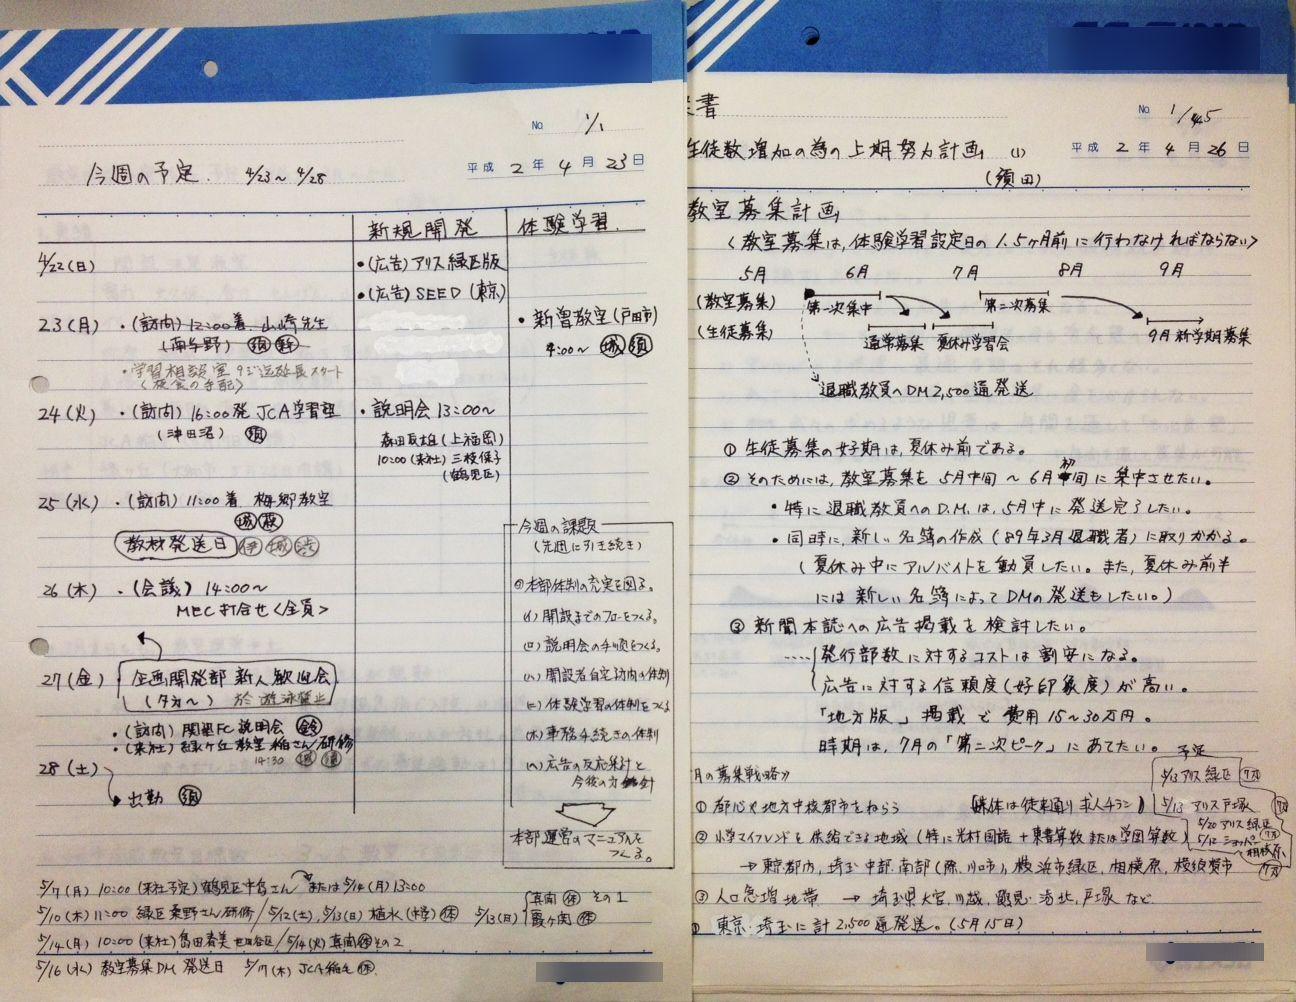 SudaNote: 書くことが仕事力を ... : 漢字リスト : 漢字